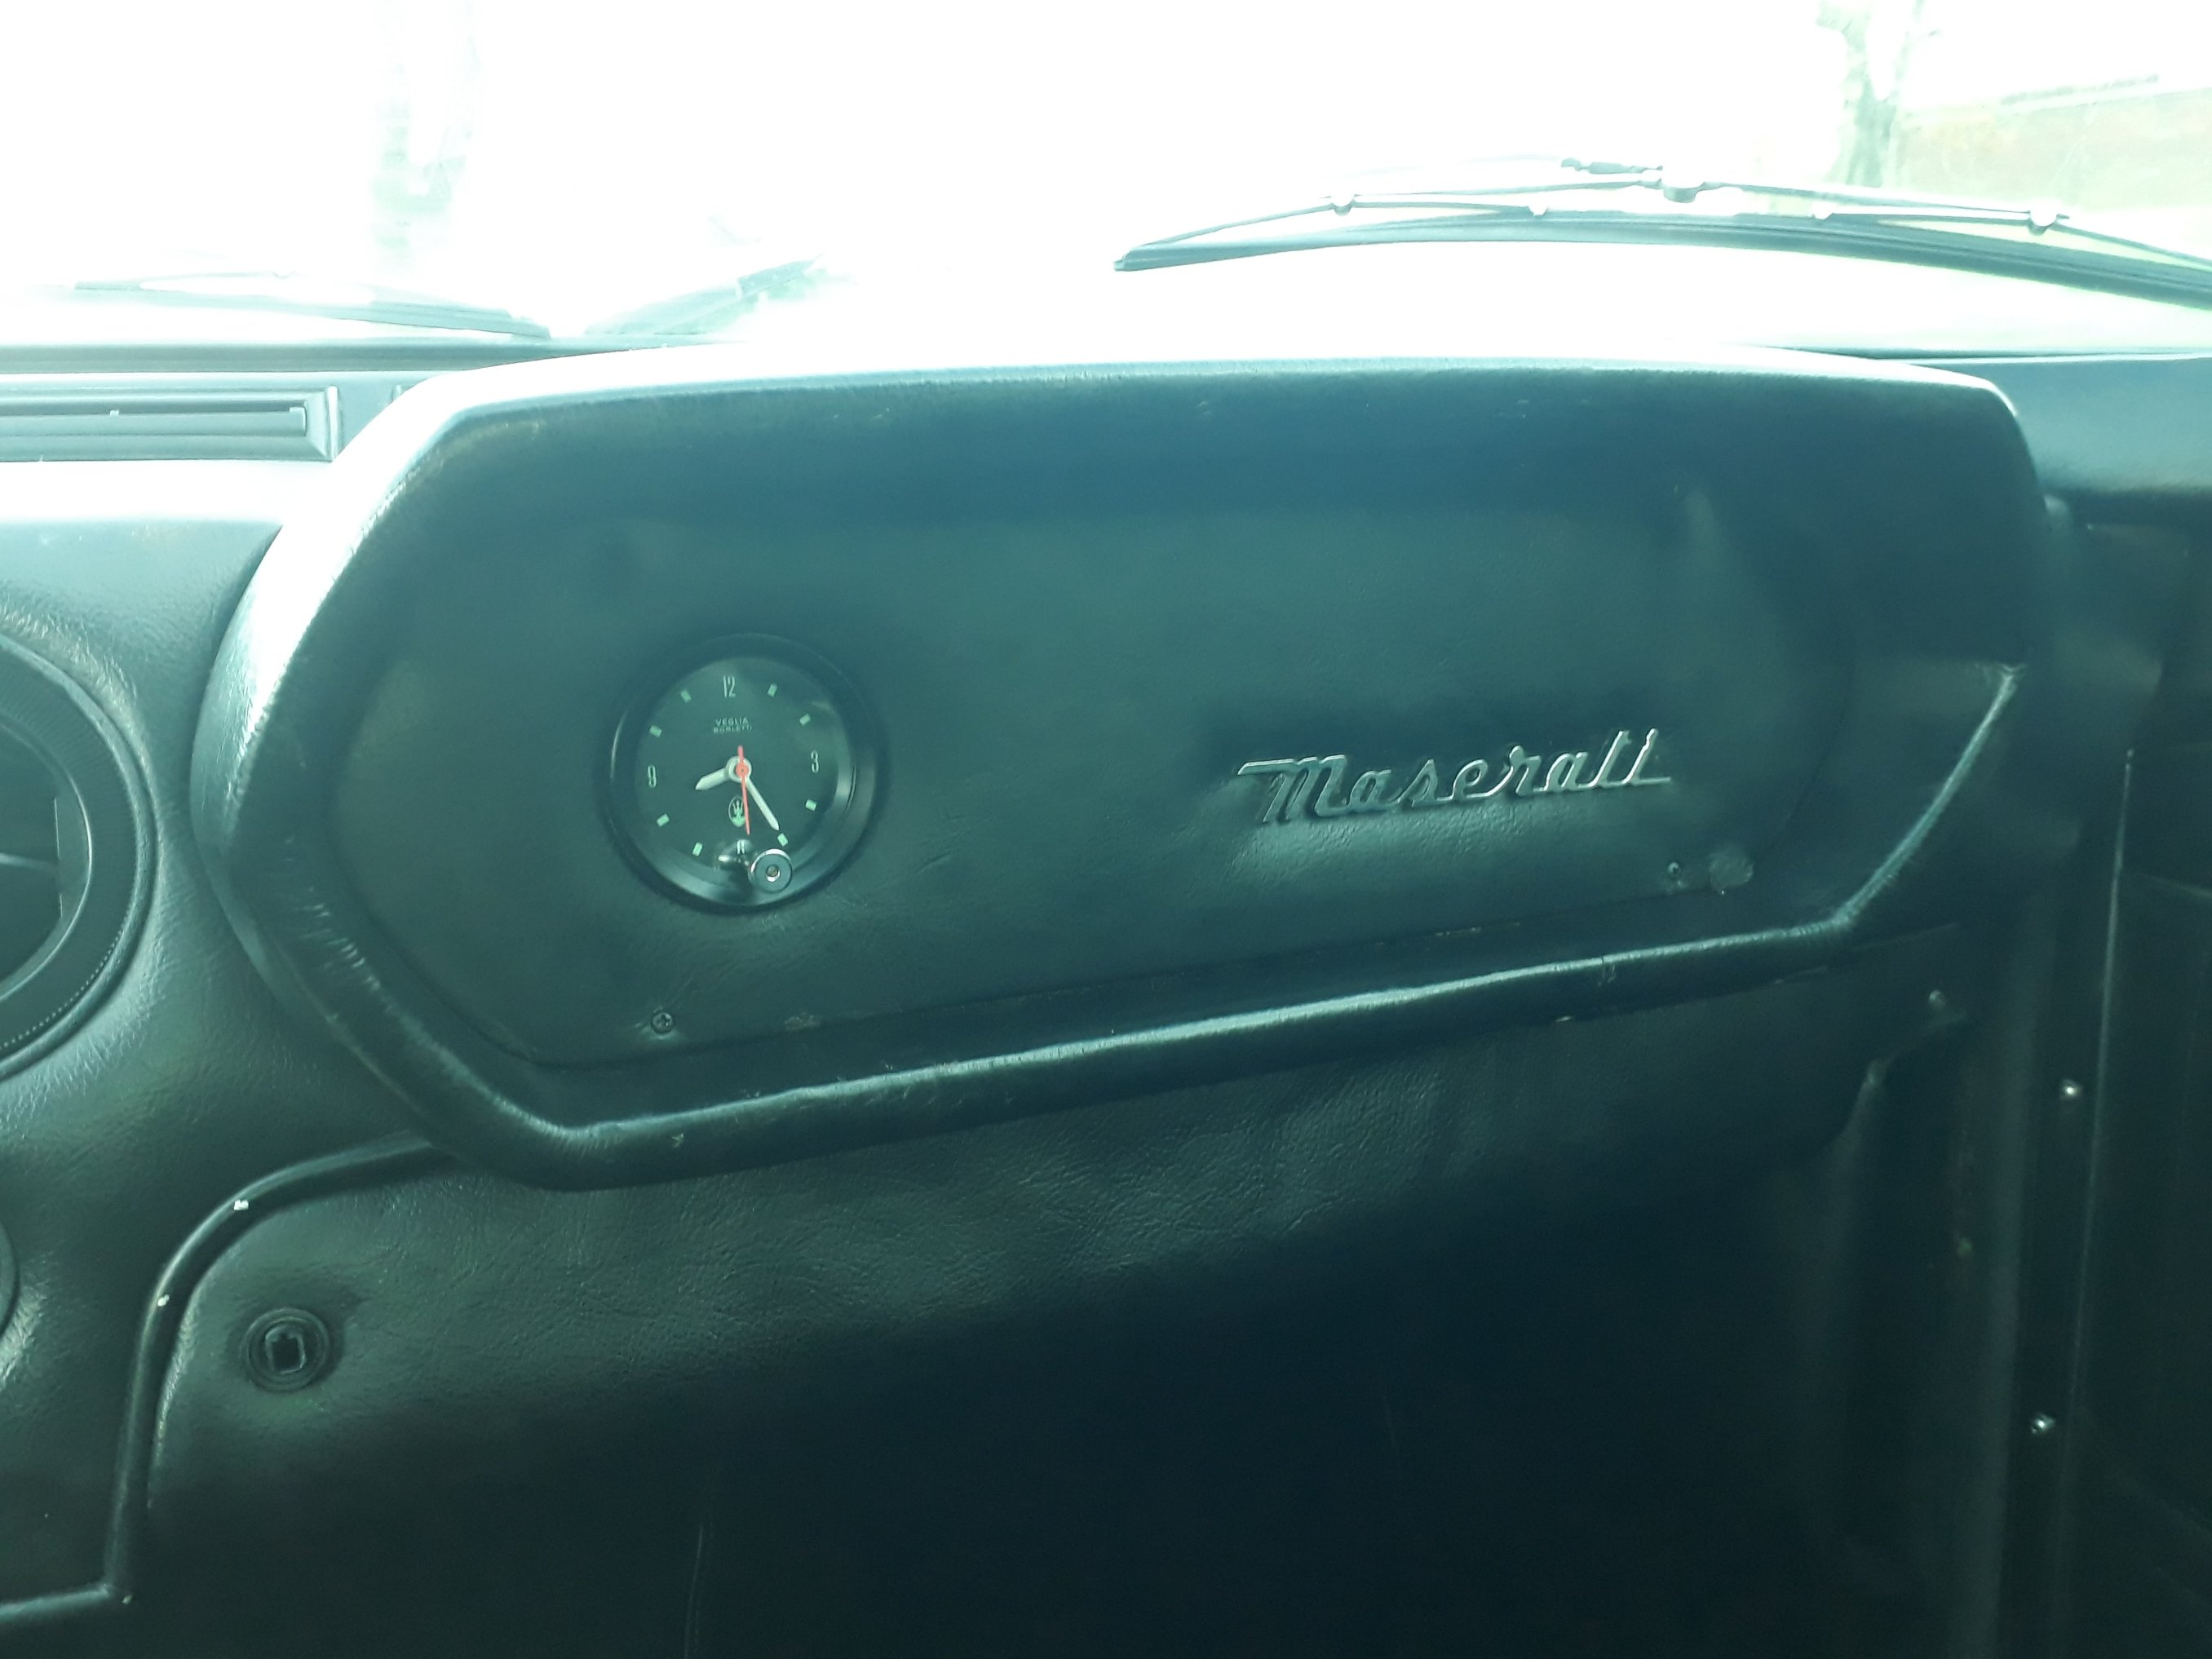 Maserati Indy 4200cc - Manual - Shmoo Automotive - TVR